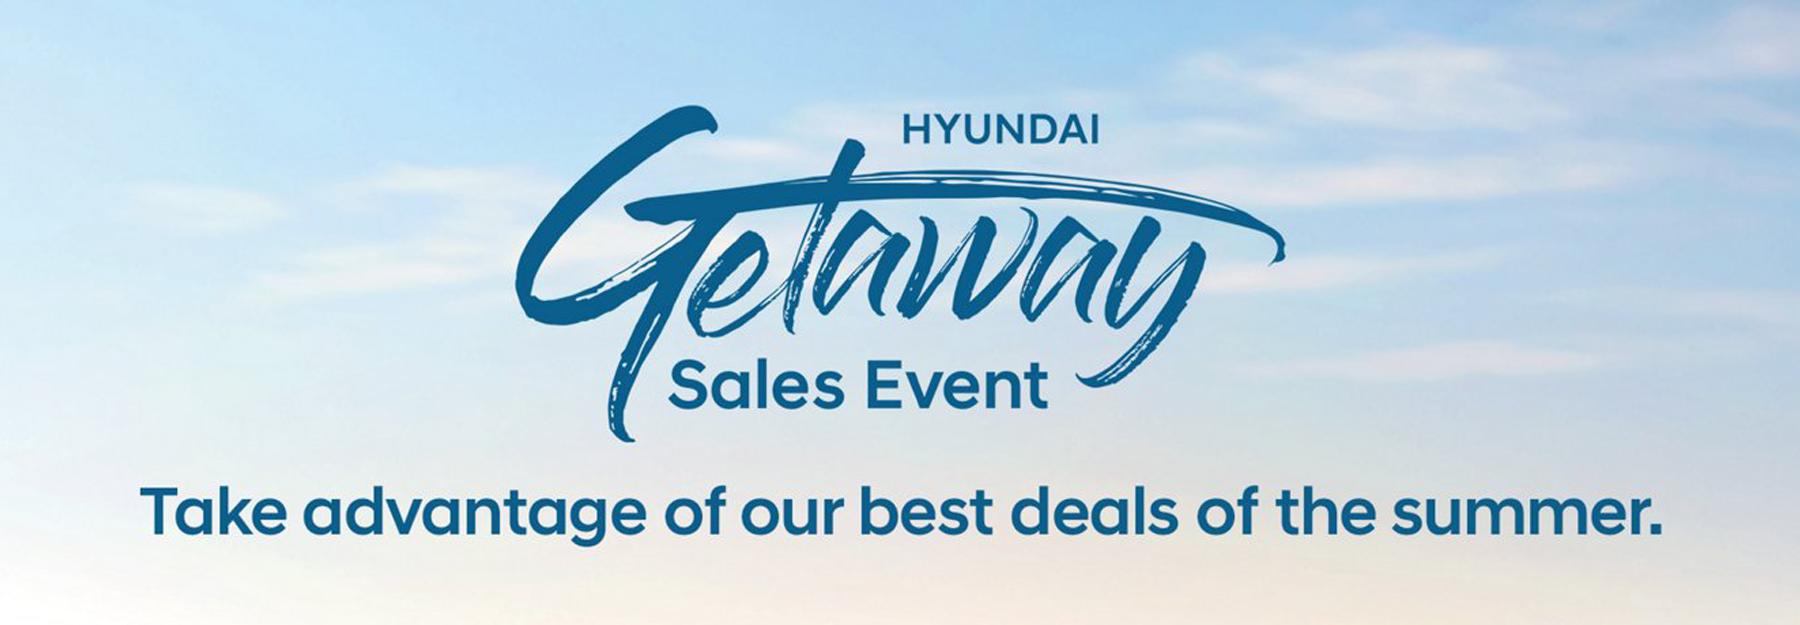 Hyundai_biggestsale